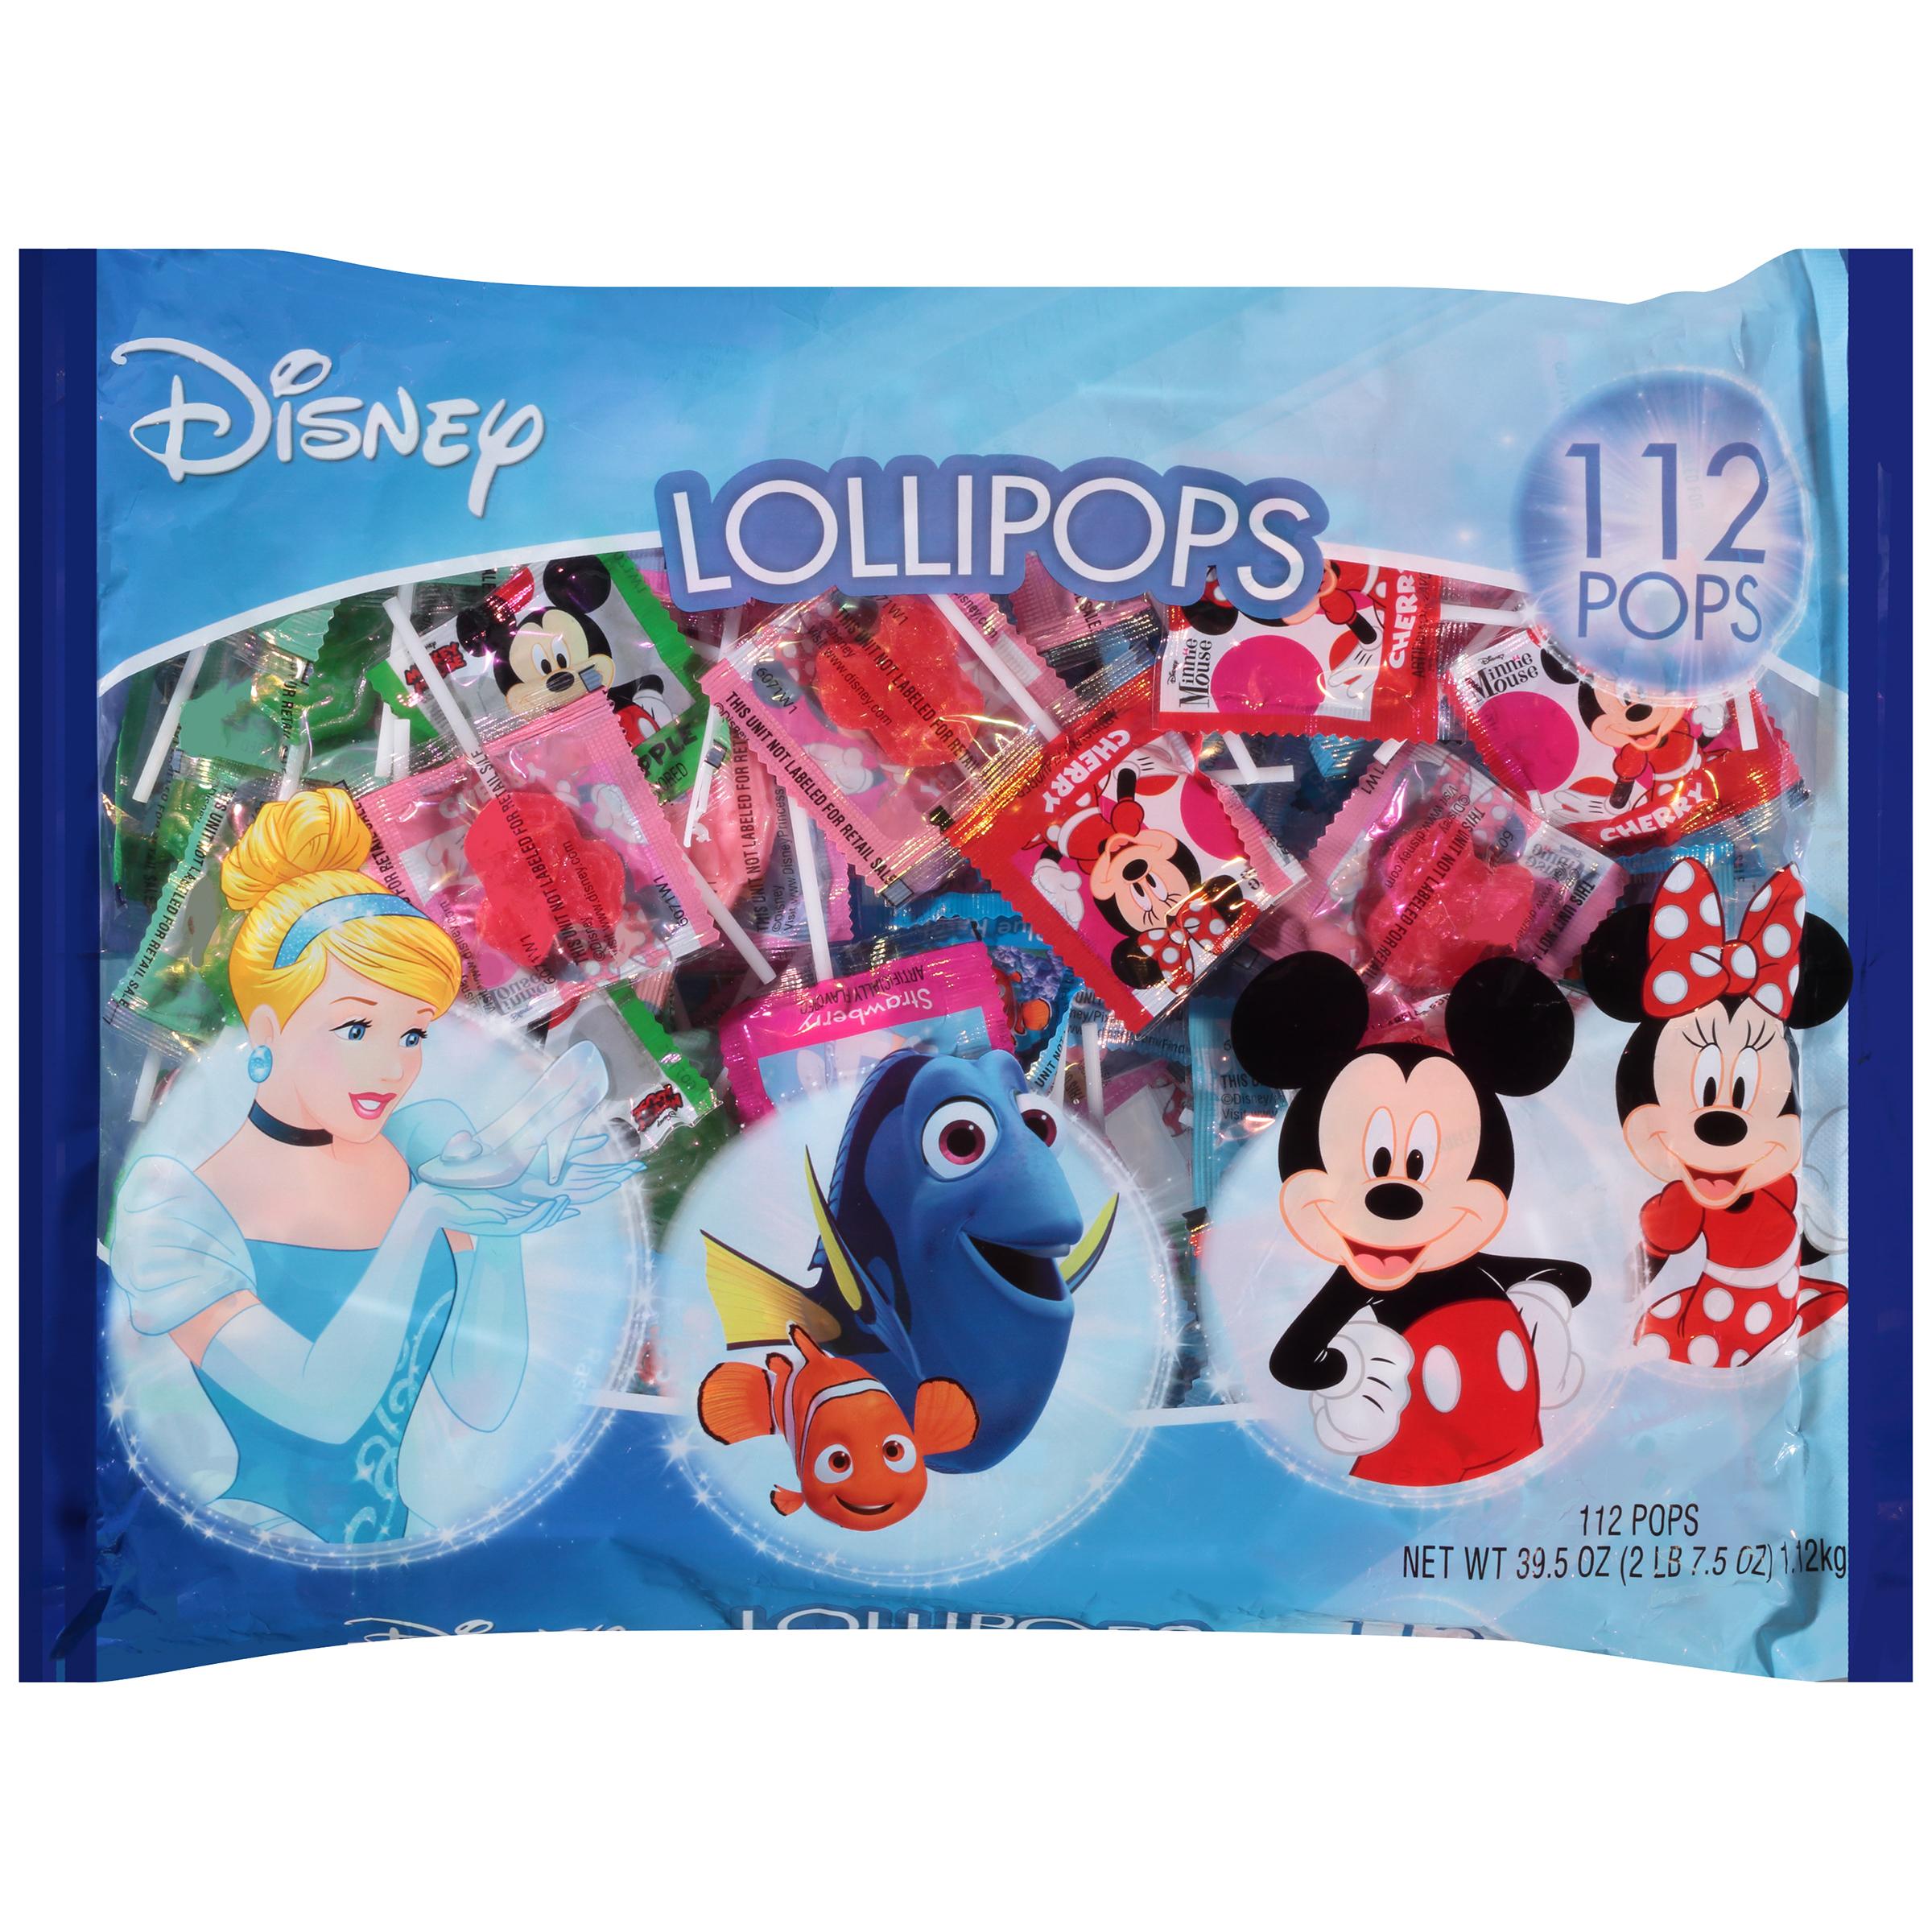 Disney Lollipops, 112 ct